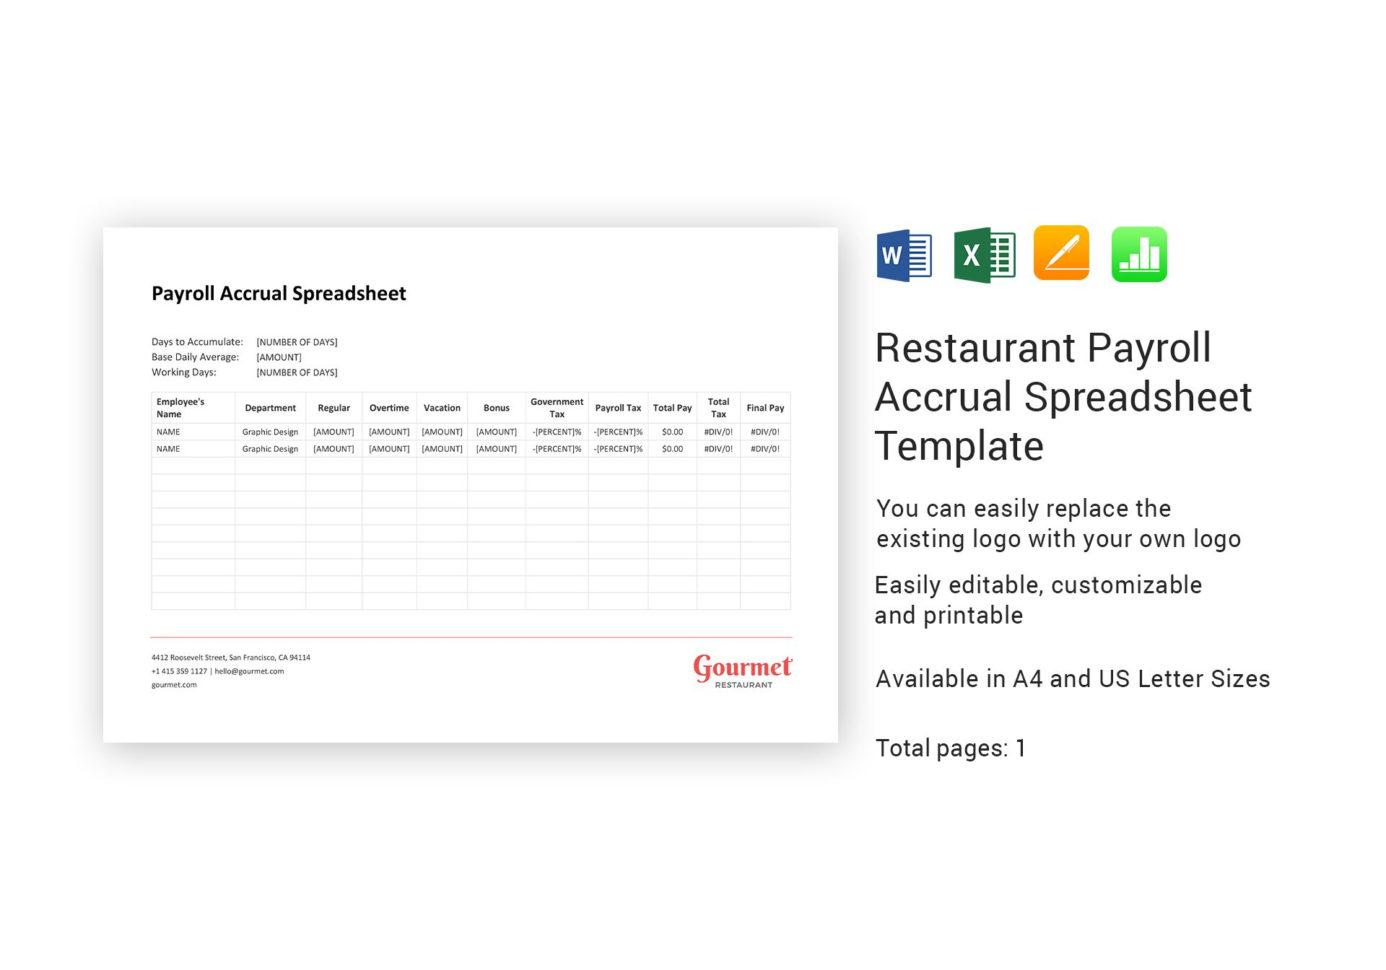 Payroll Accrual Spreadsheet Inside Restaurant Payroll Accrual Spreadsheet Template In Word, Excel